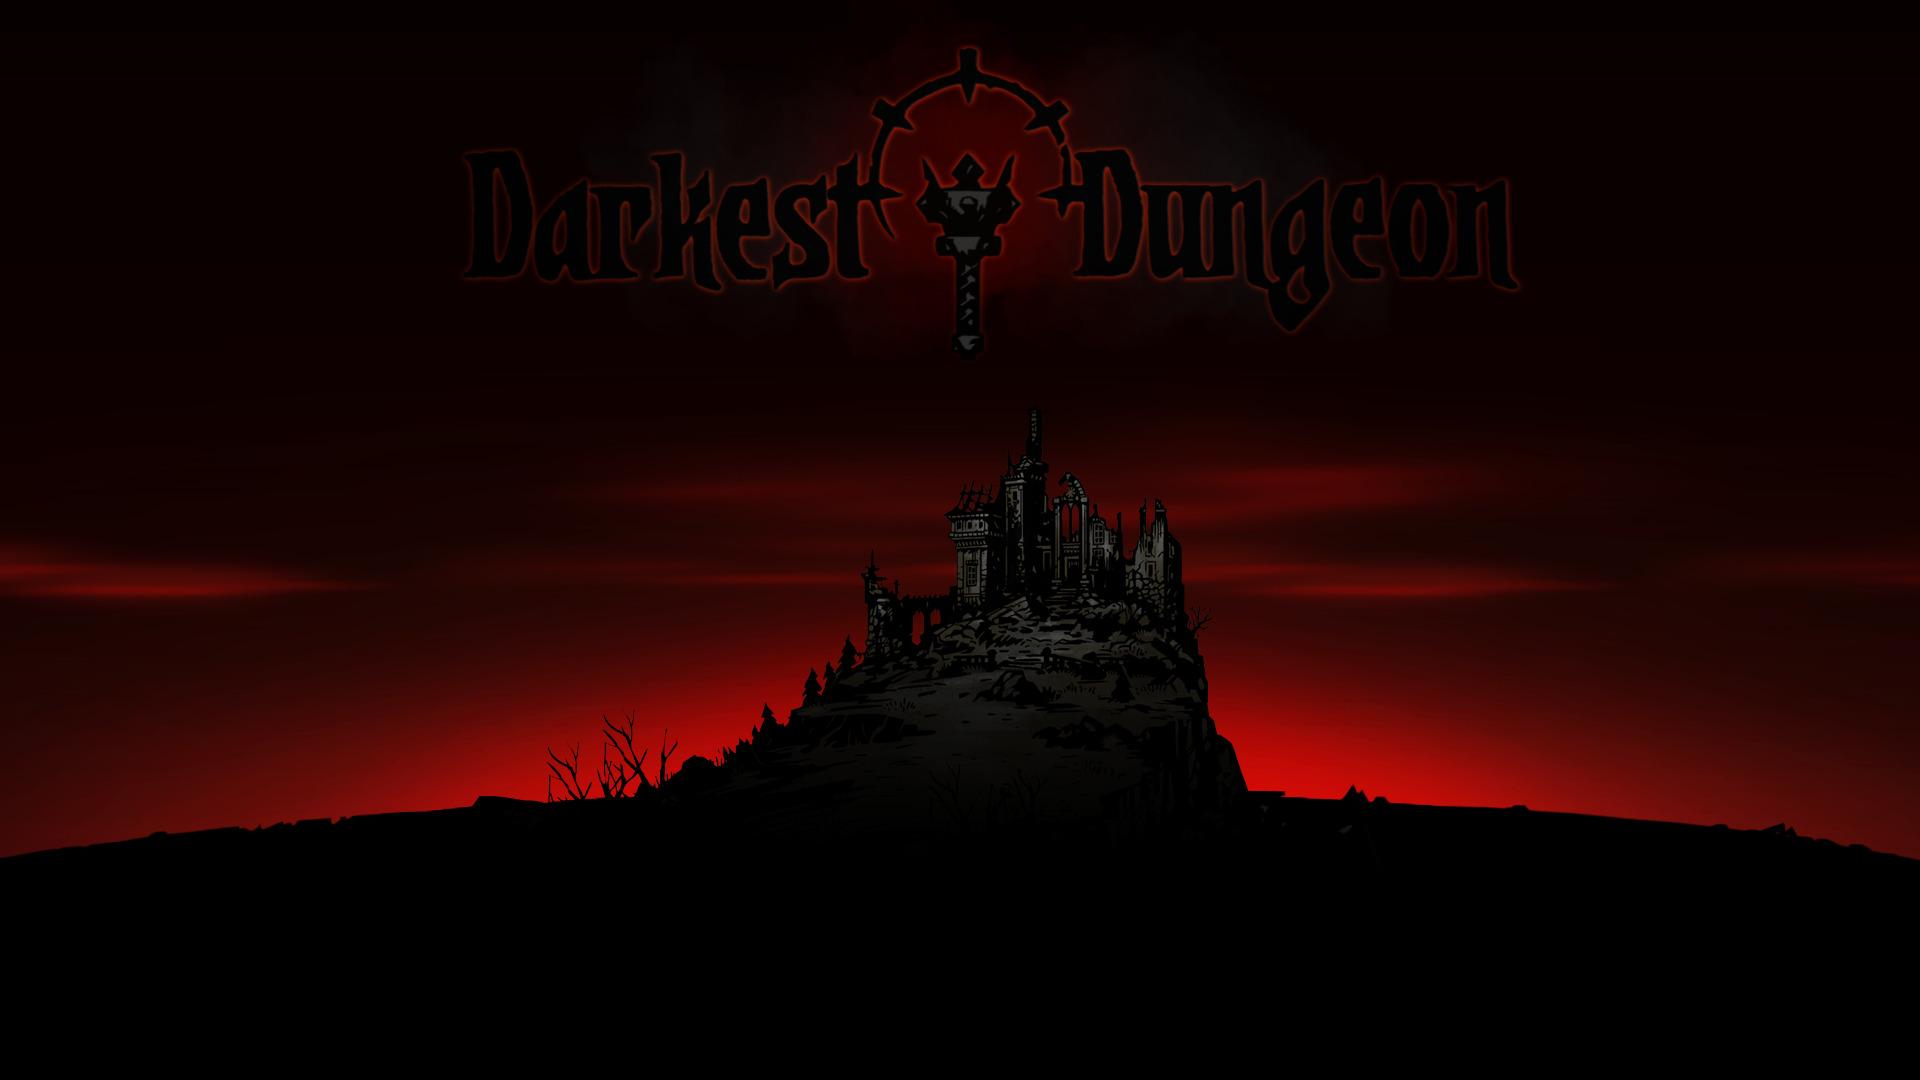 Darkest Dungeon: The Kotaku Review